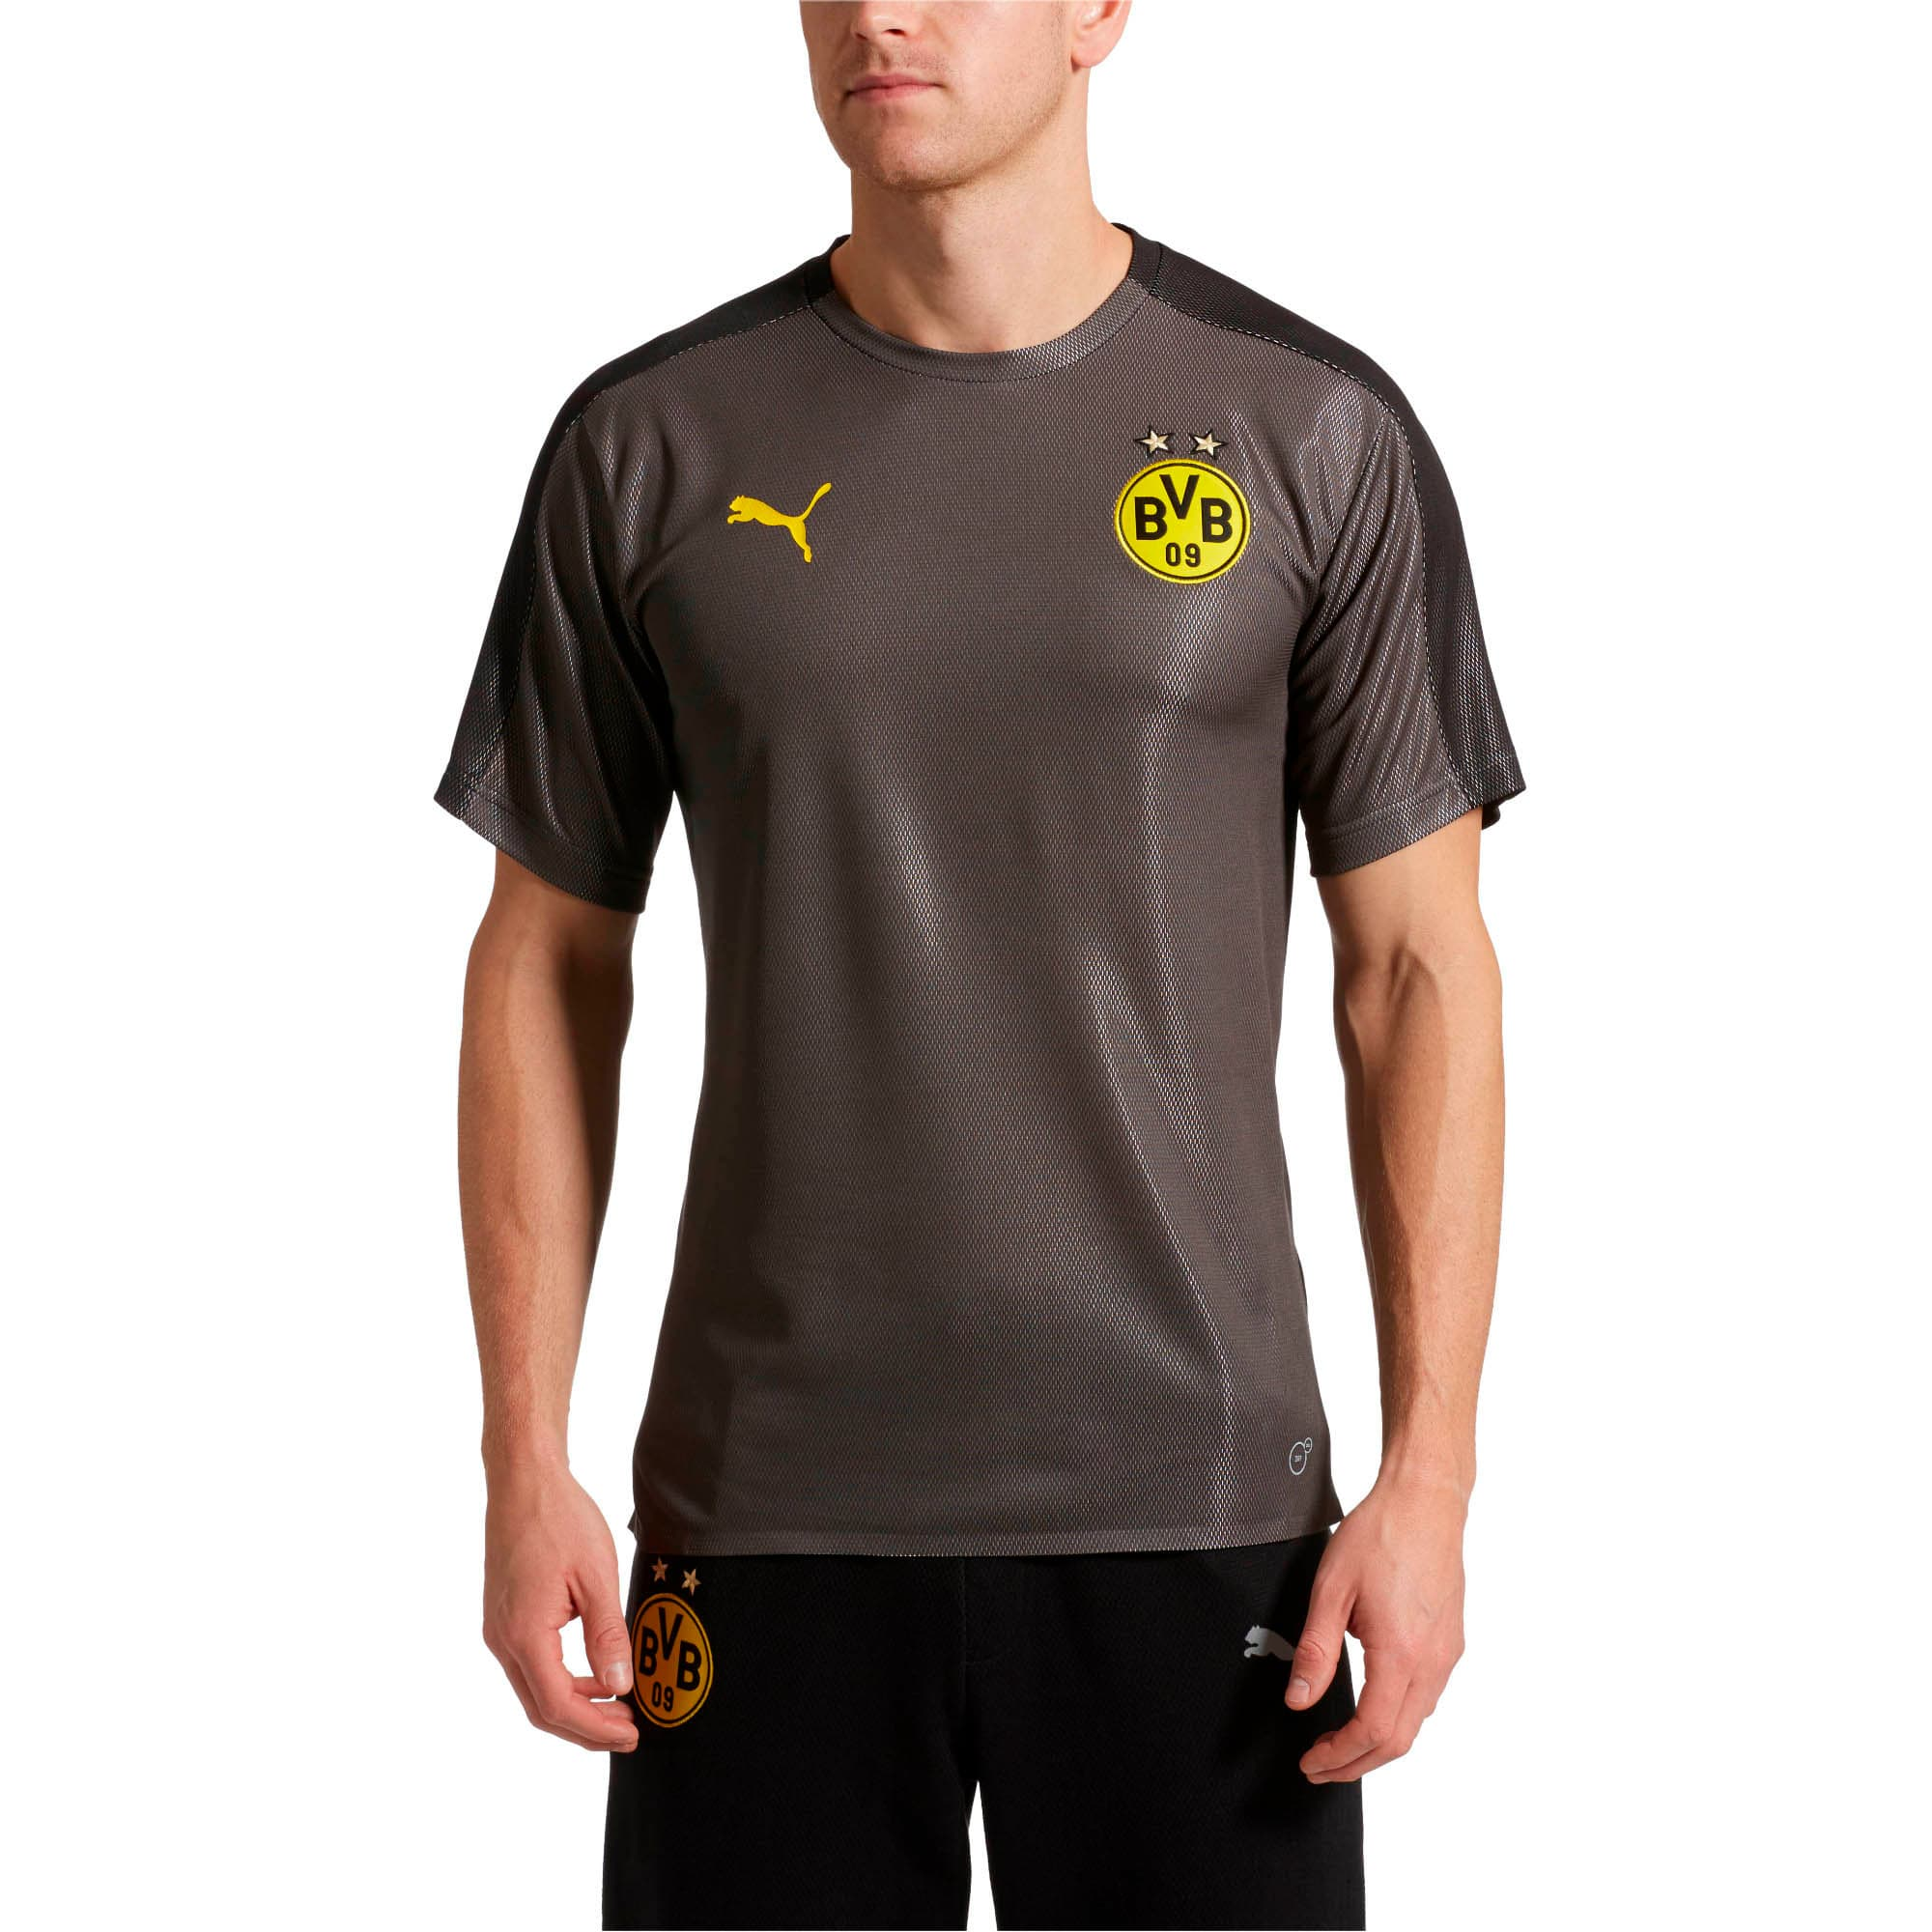 Thumbnail 1 of BVB Men's Stadium Jersey, Asphalt-Puma Black, medium